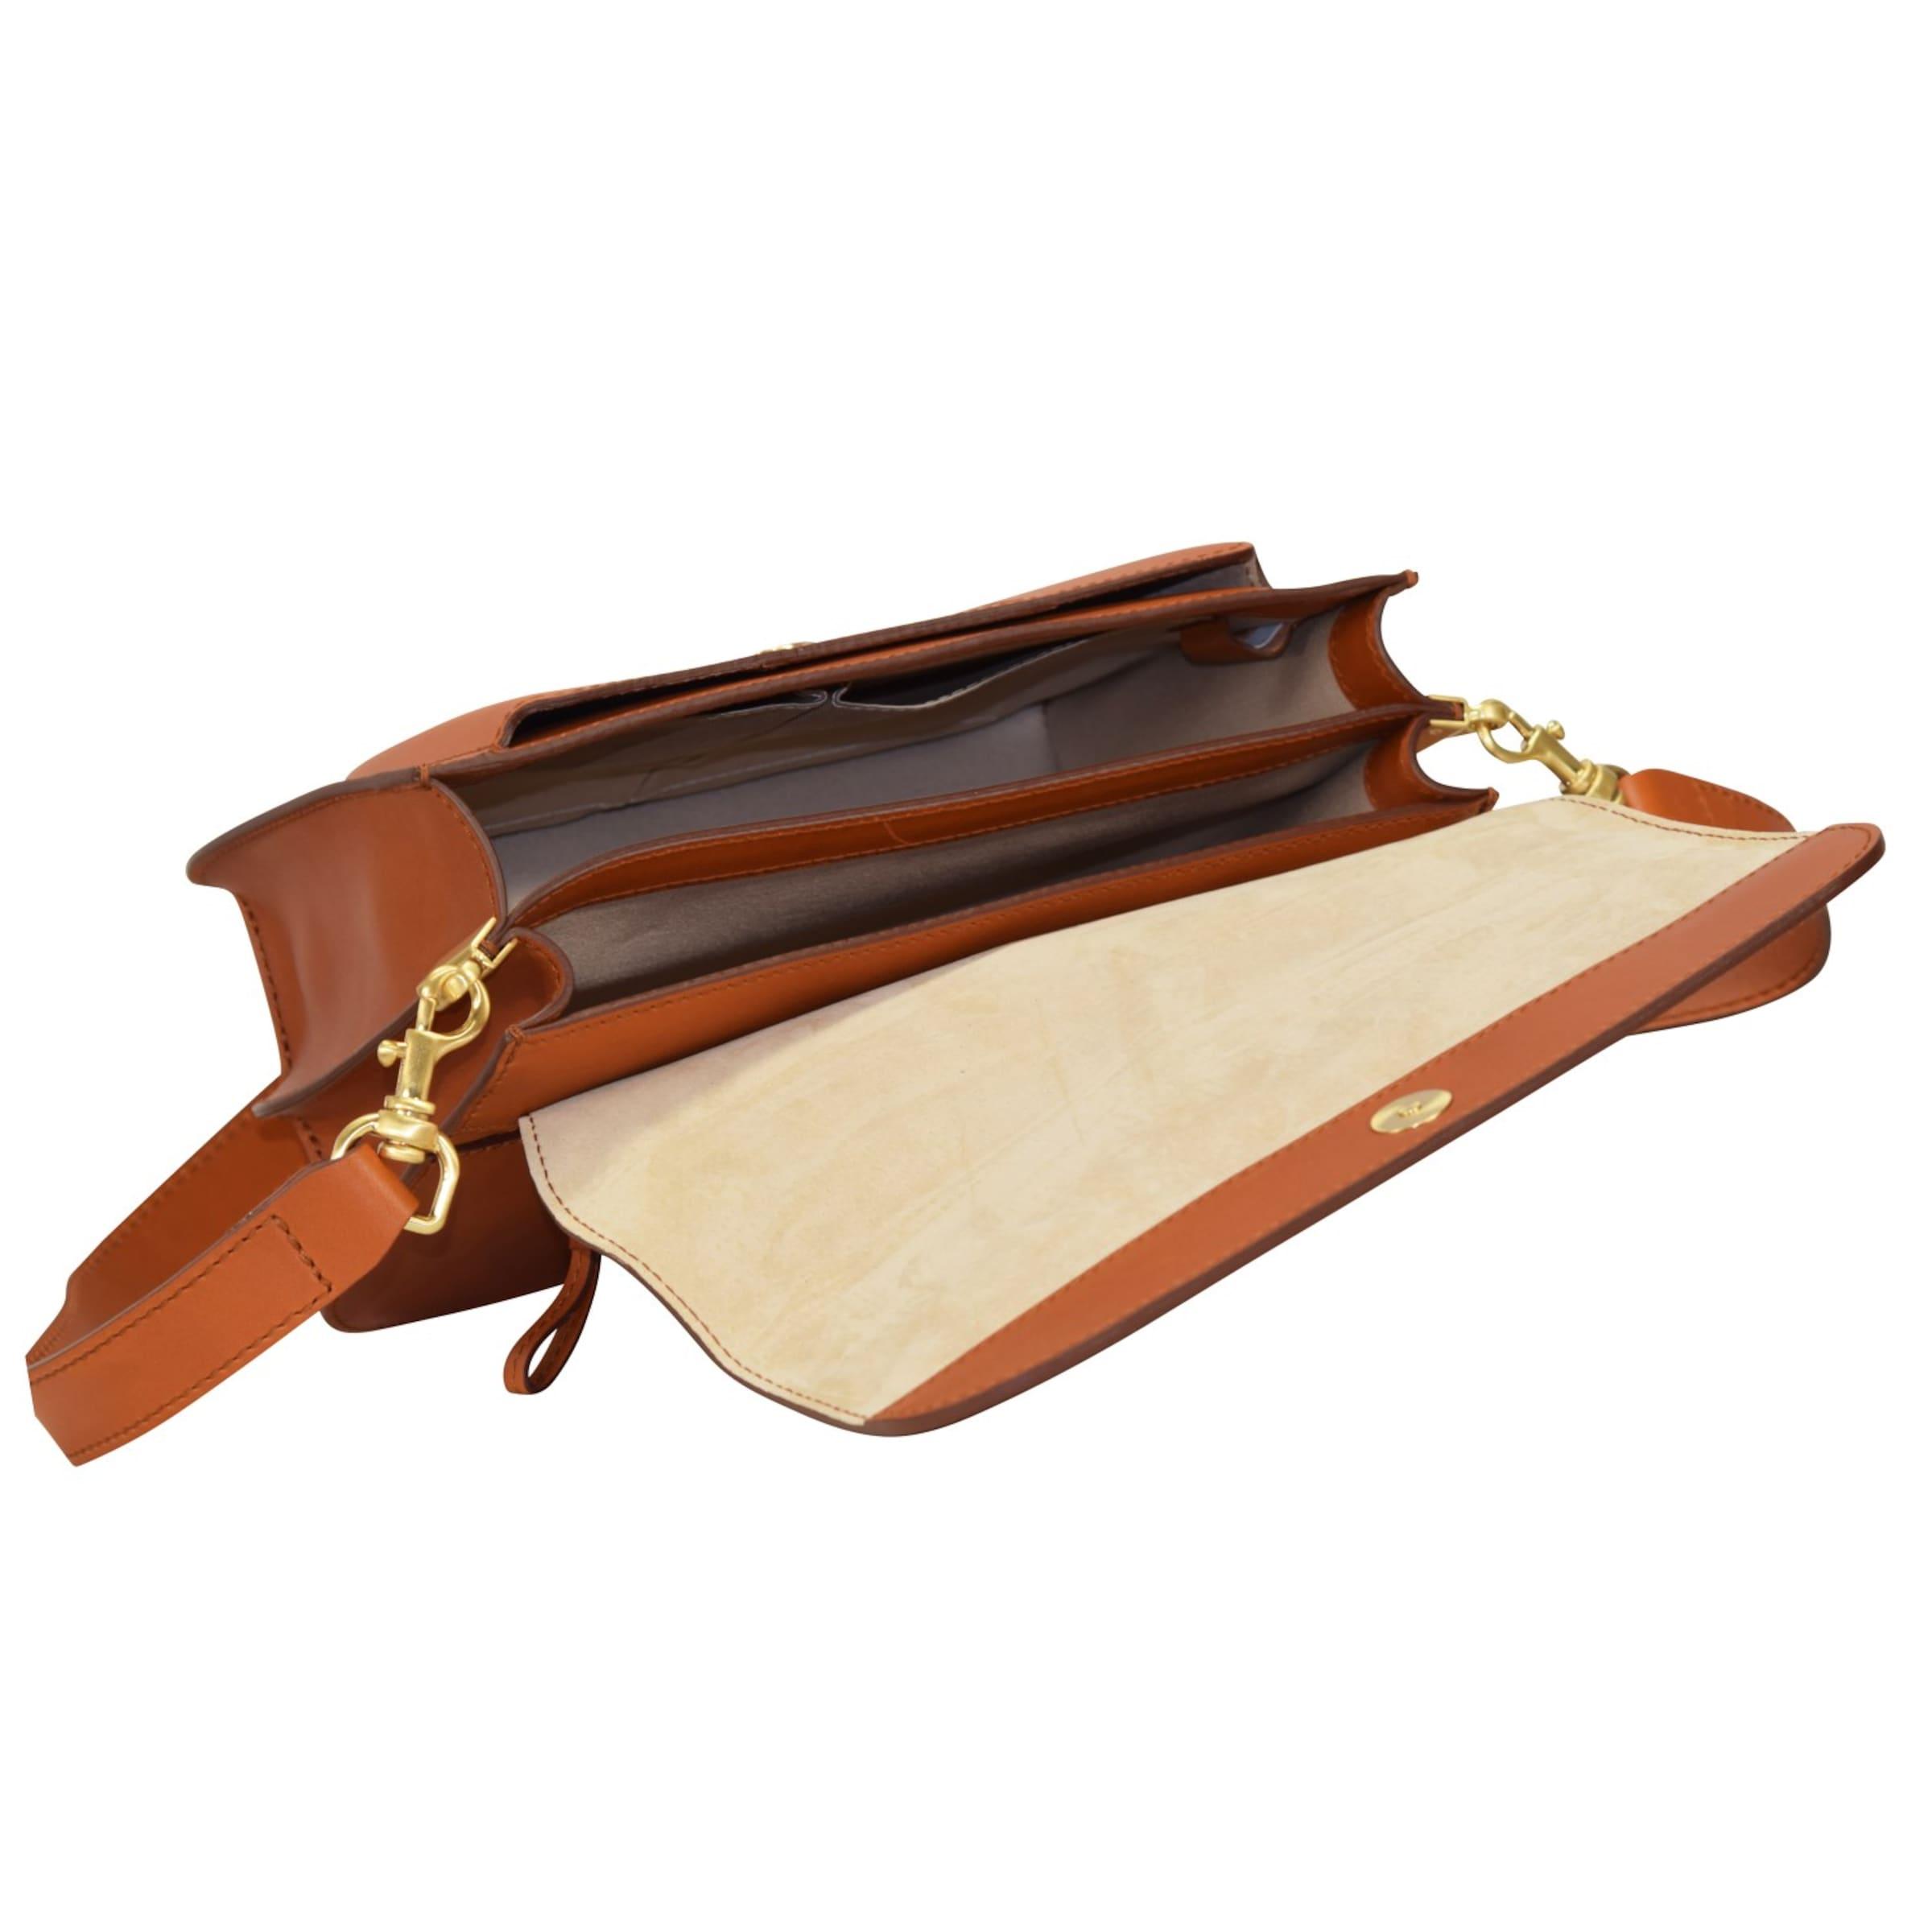 Billig Verkauf Neueste BREE 'Cambridge 7' Umhängetasche Leder 26 cm Auslass Neue Ankunft u6wgjI